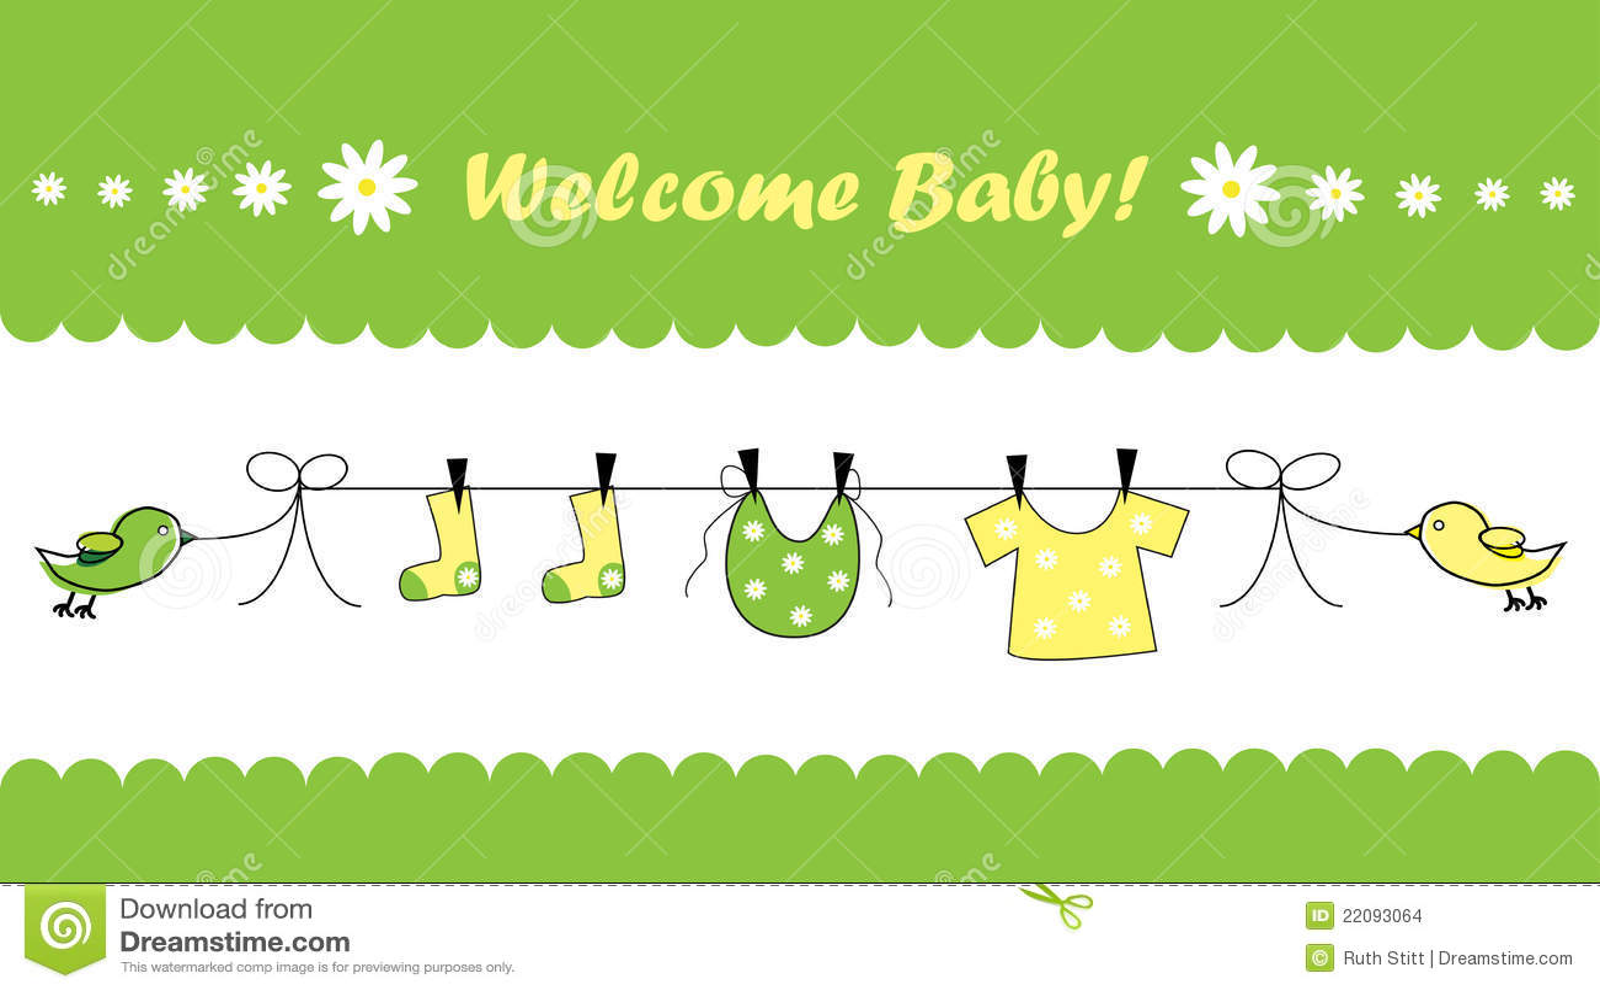 Free Baby Boy Shower Invitations is nice invitation ideas